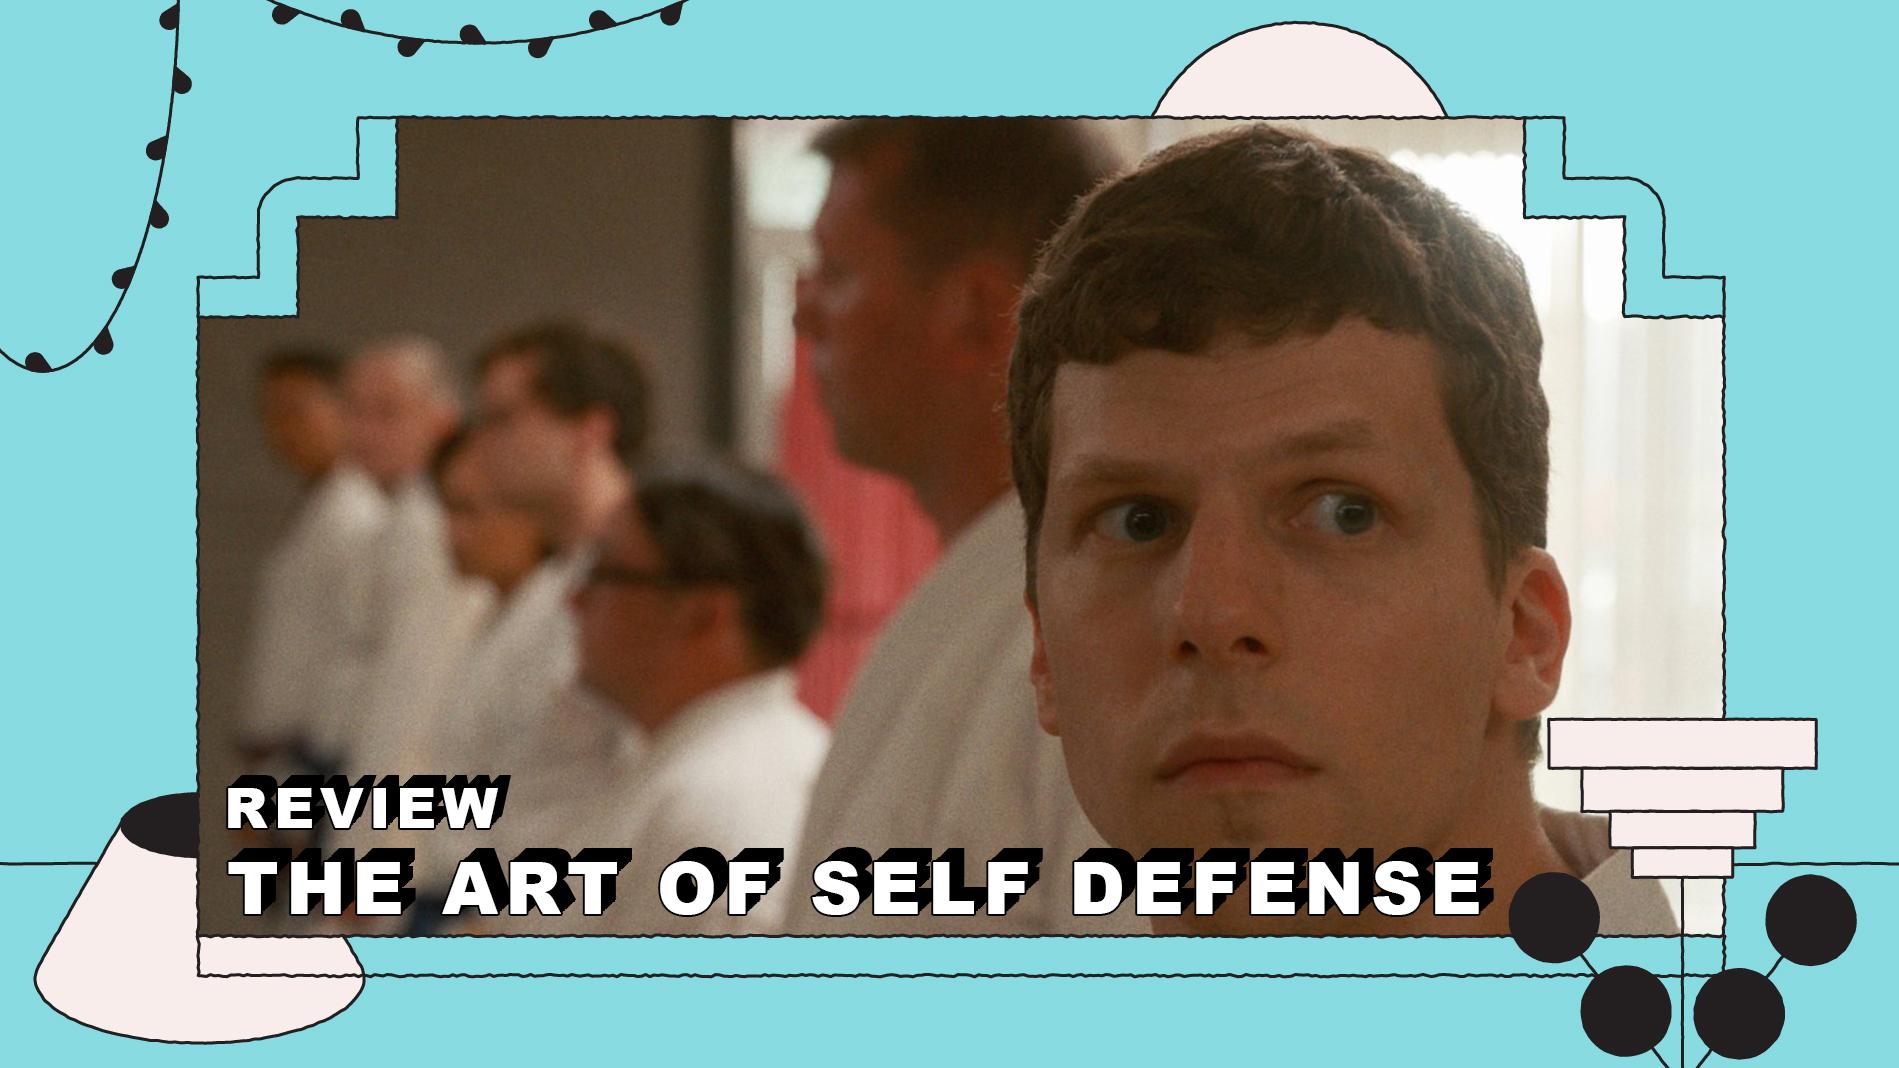 Art of Self Defense Cover Image.jpg